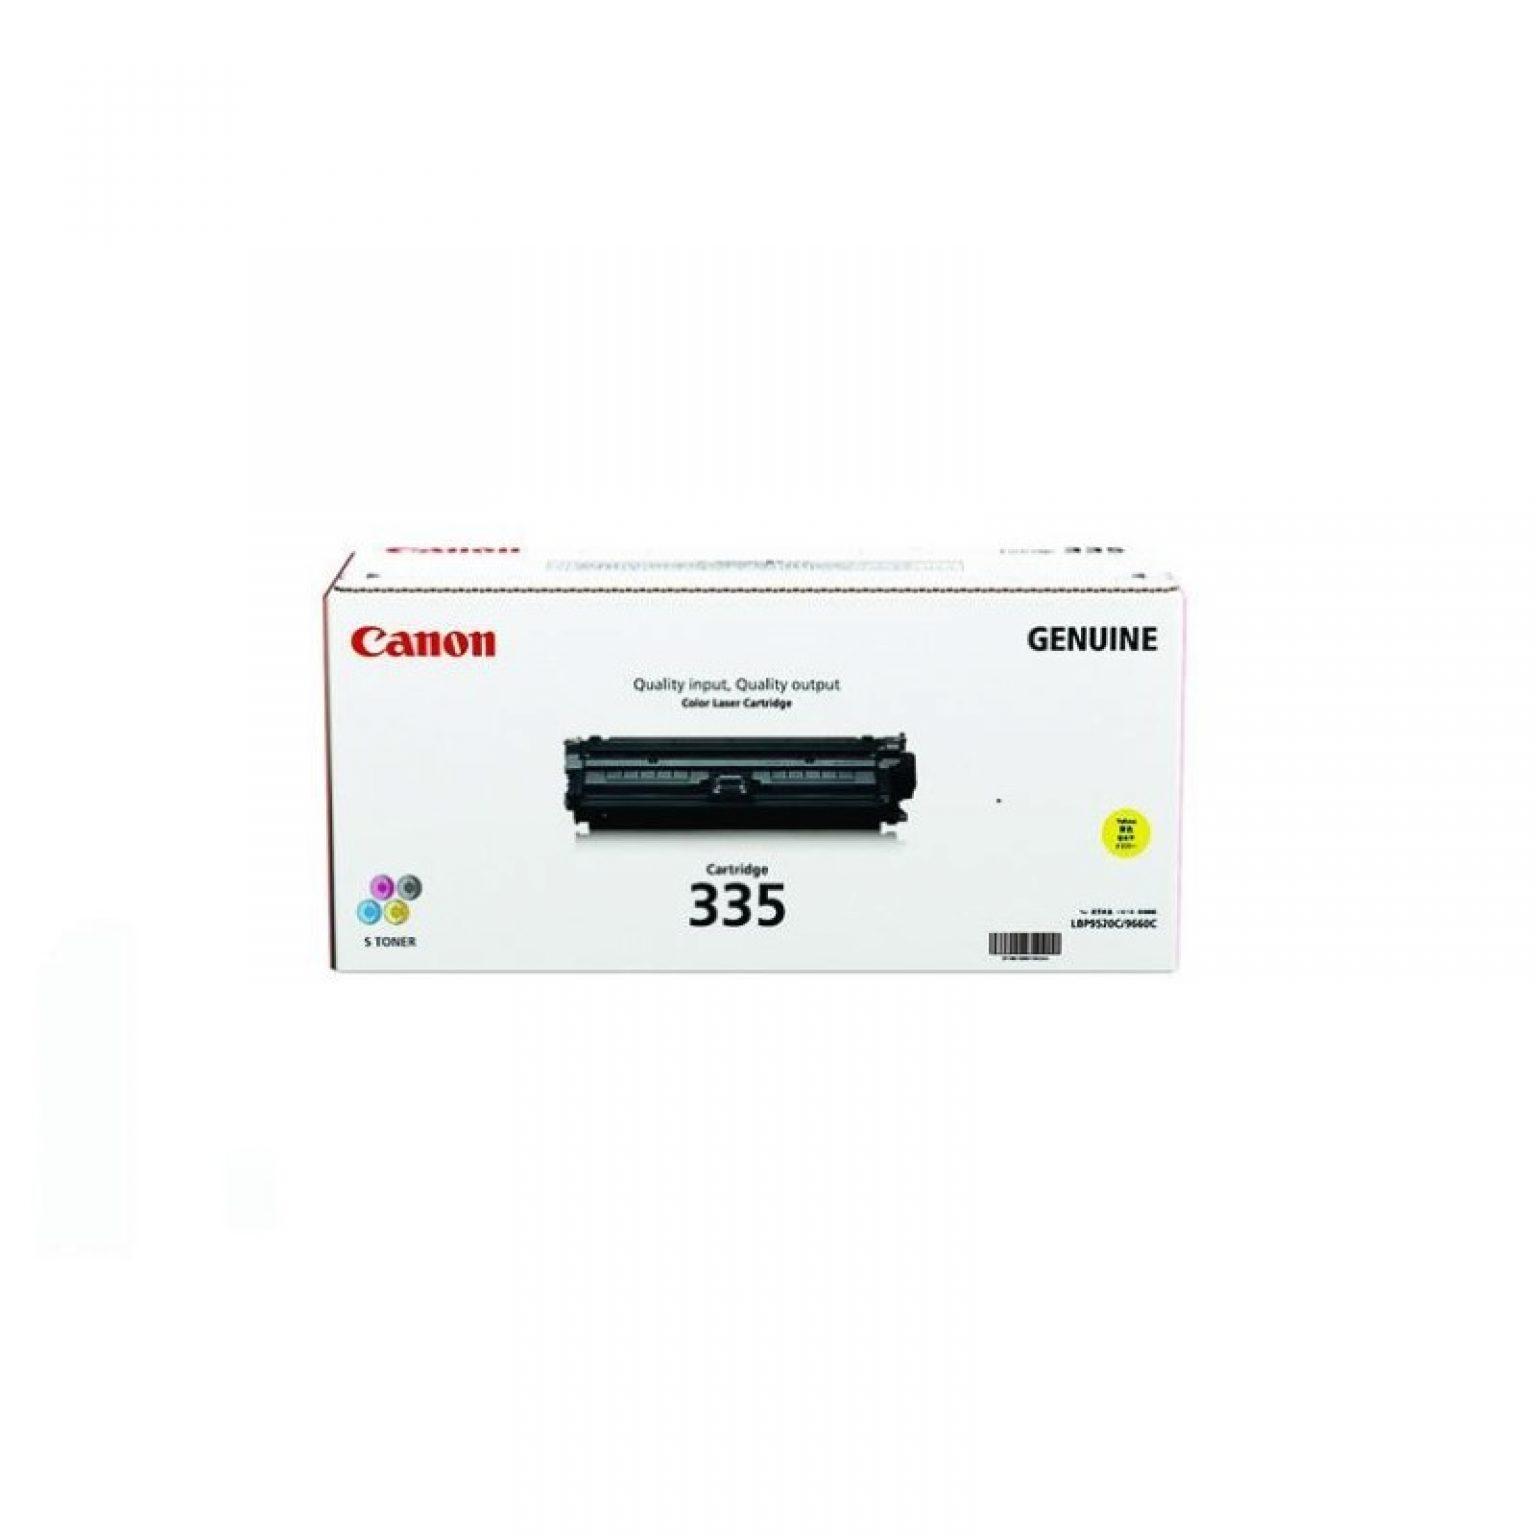 CANON - Toner cartridge 335 yellow High Yield for LBP841CDN/843CX [EP335Y]